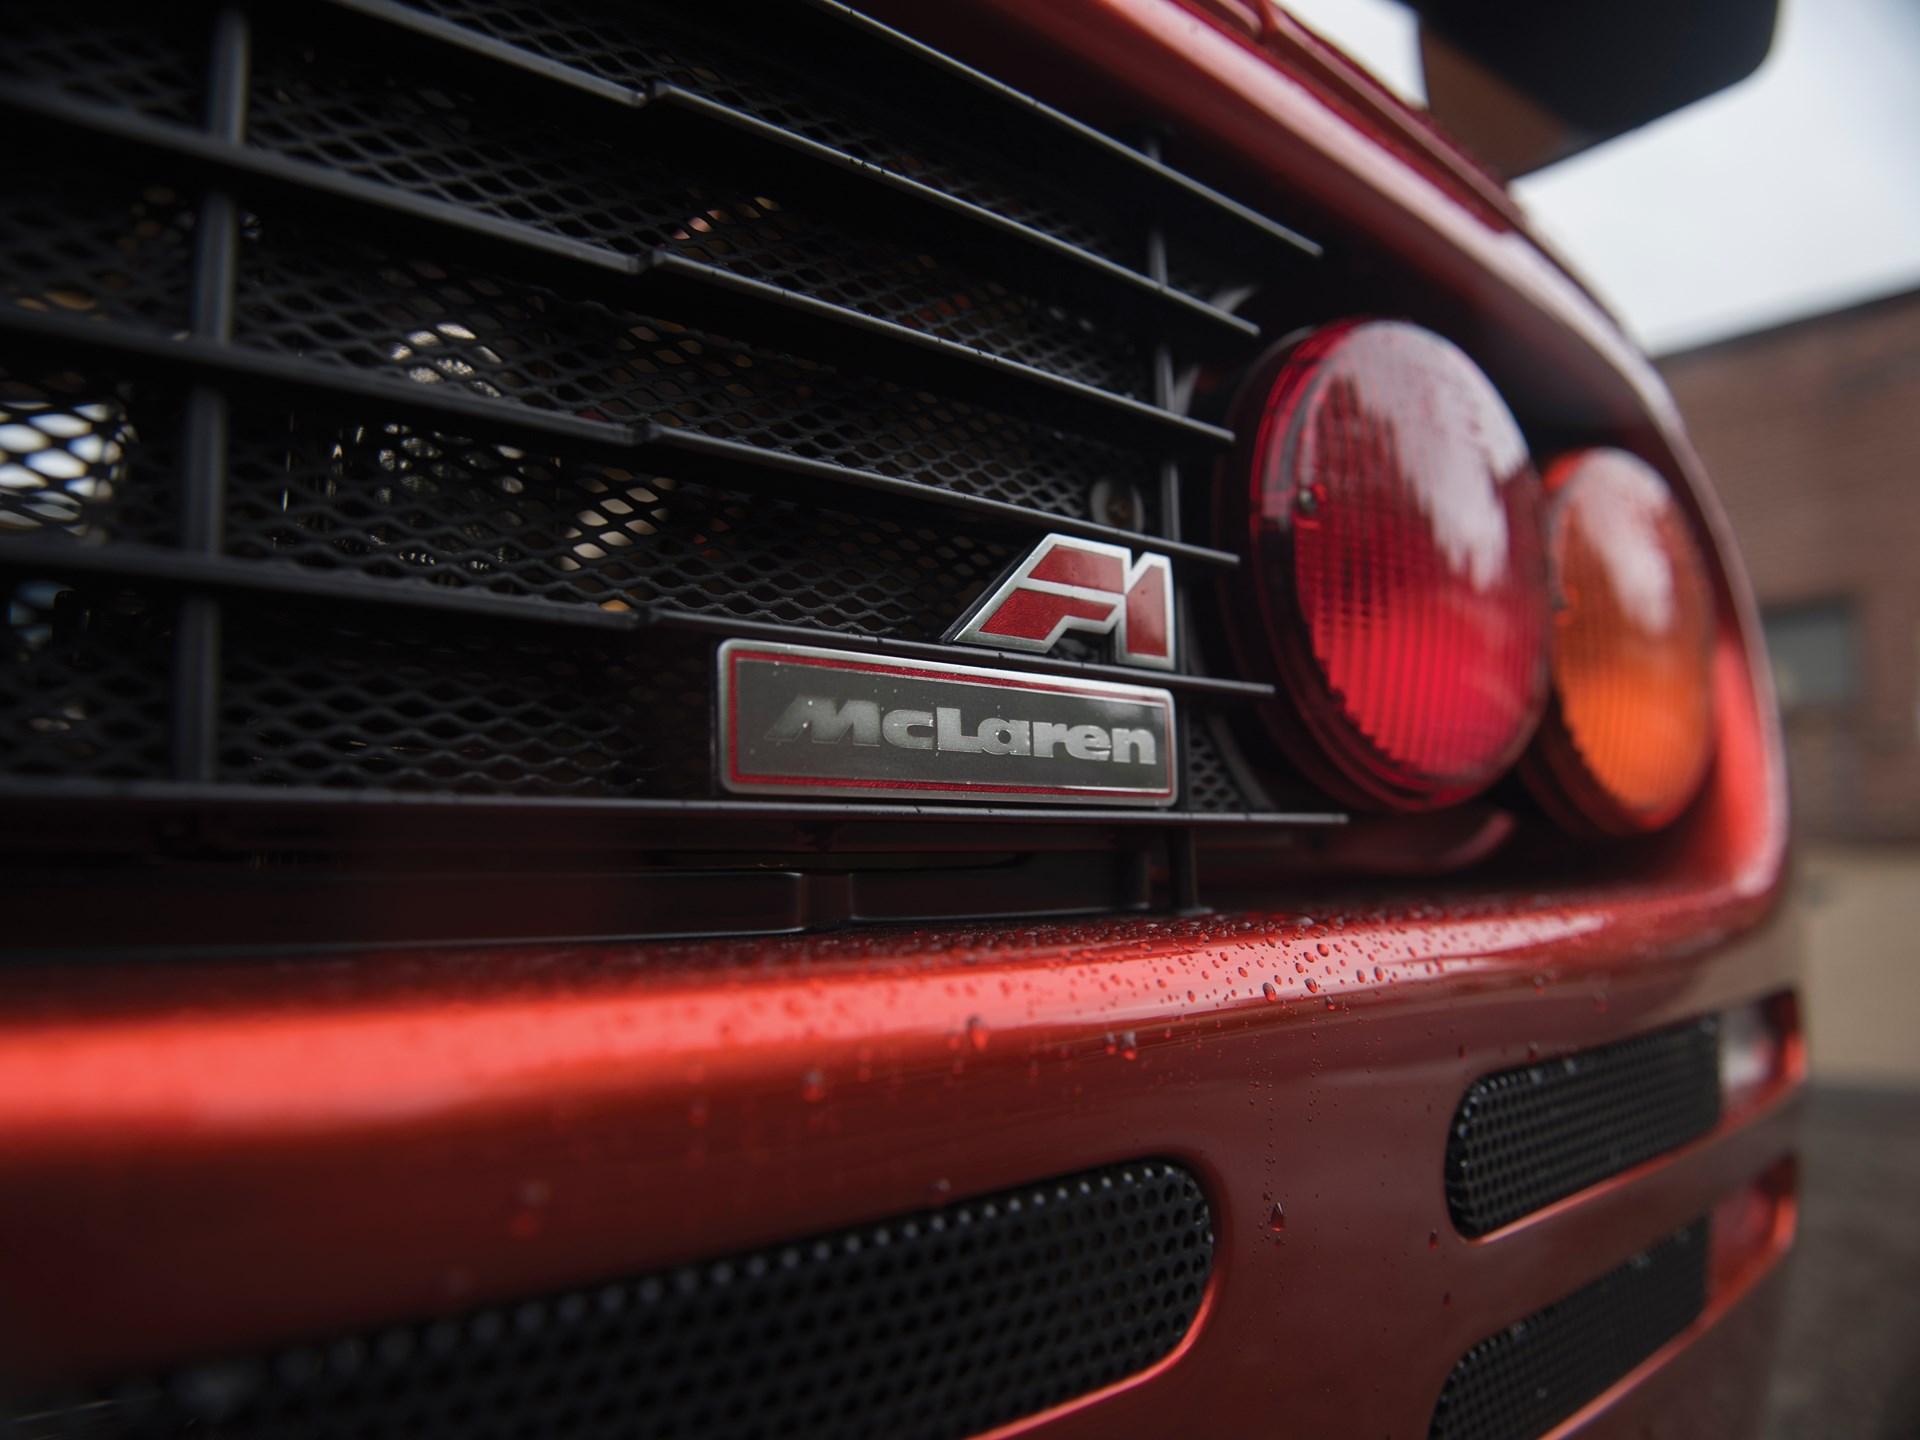 1998 McLaren F1 'LM-Specification'